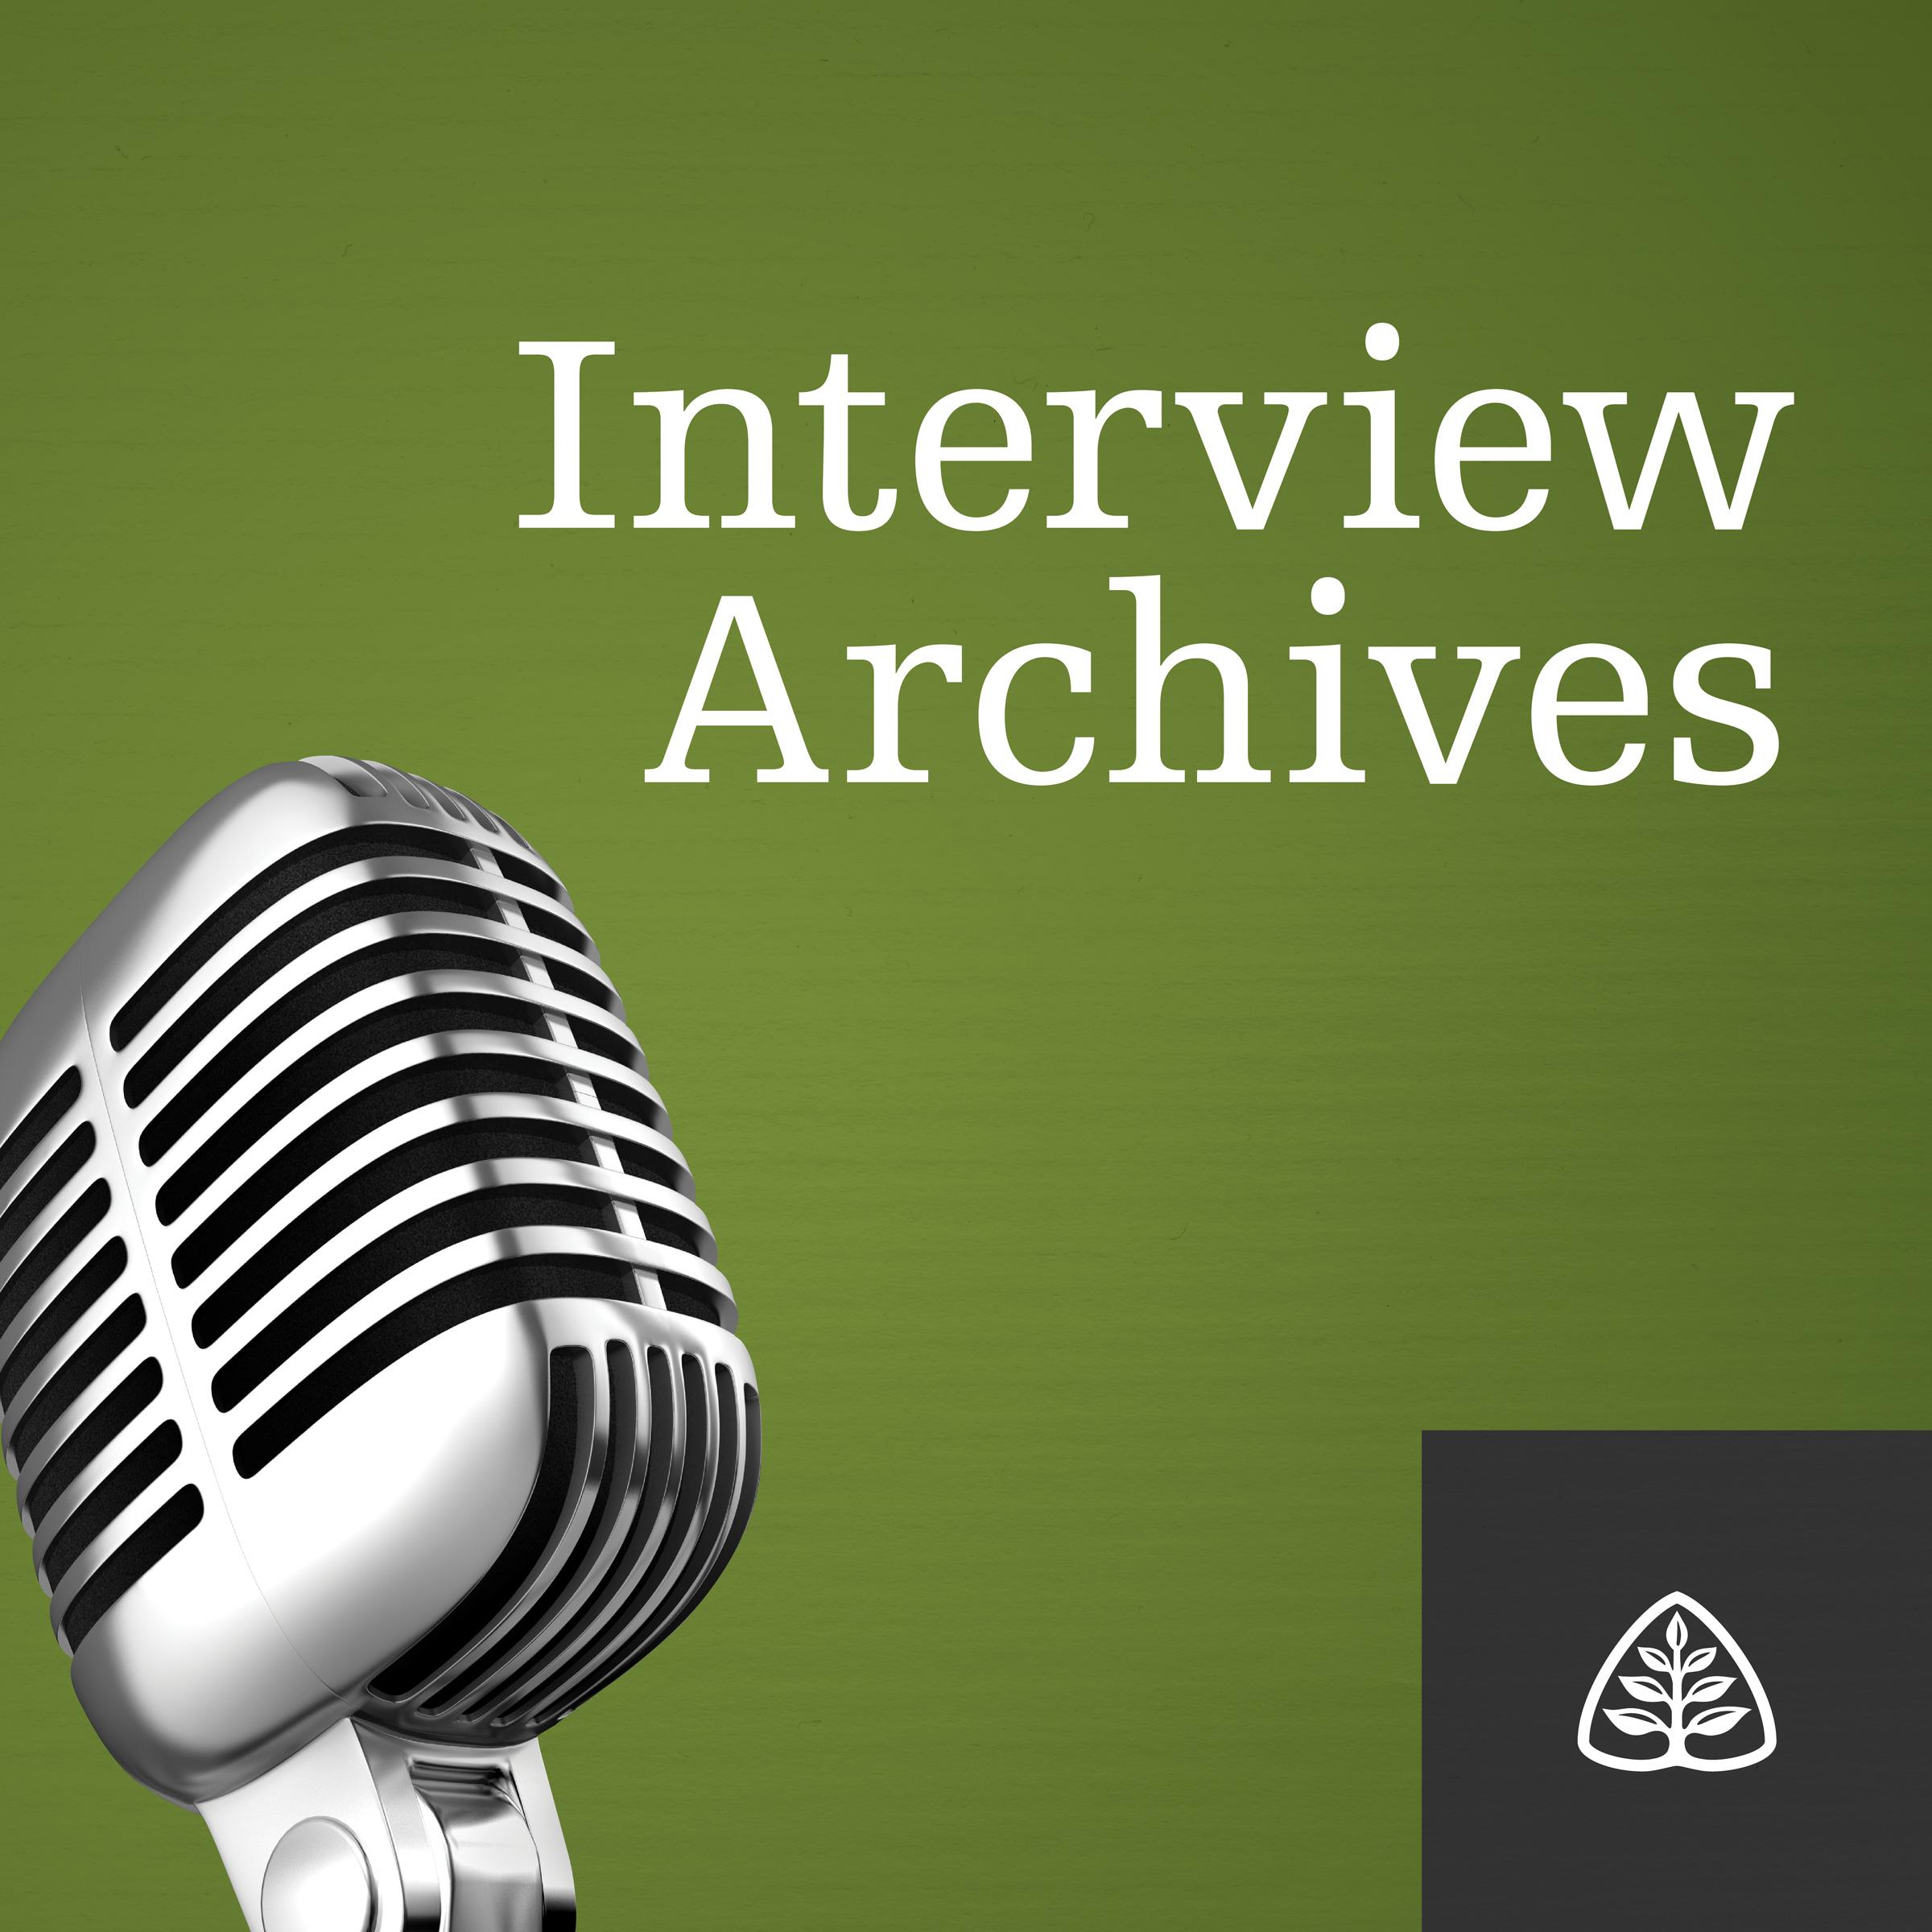 Ligonier Interview Archives